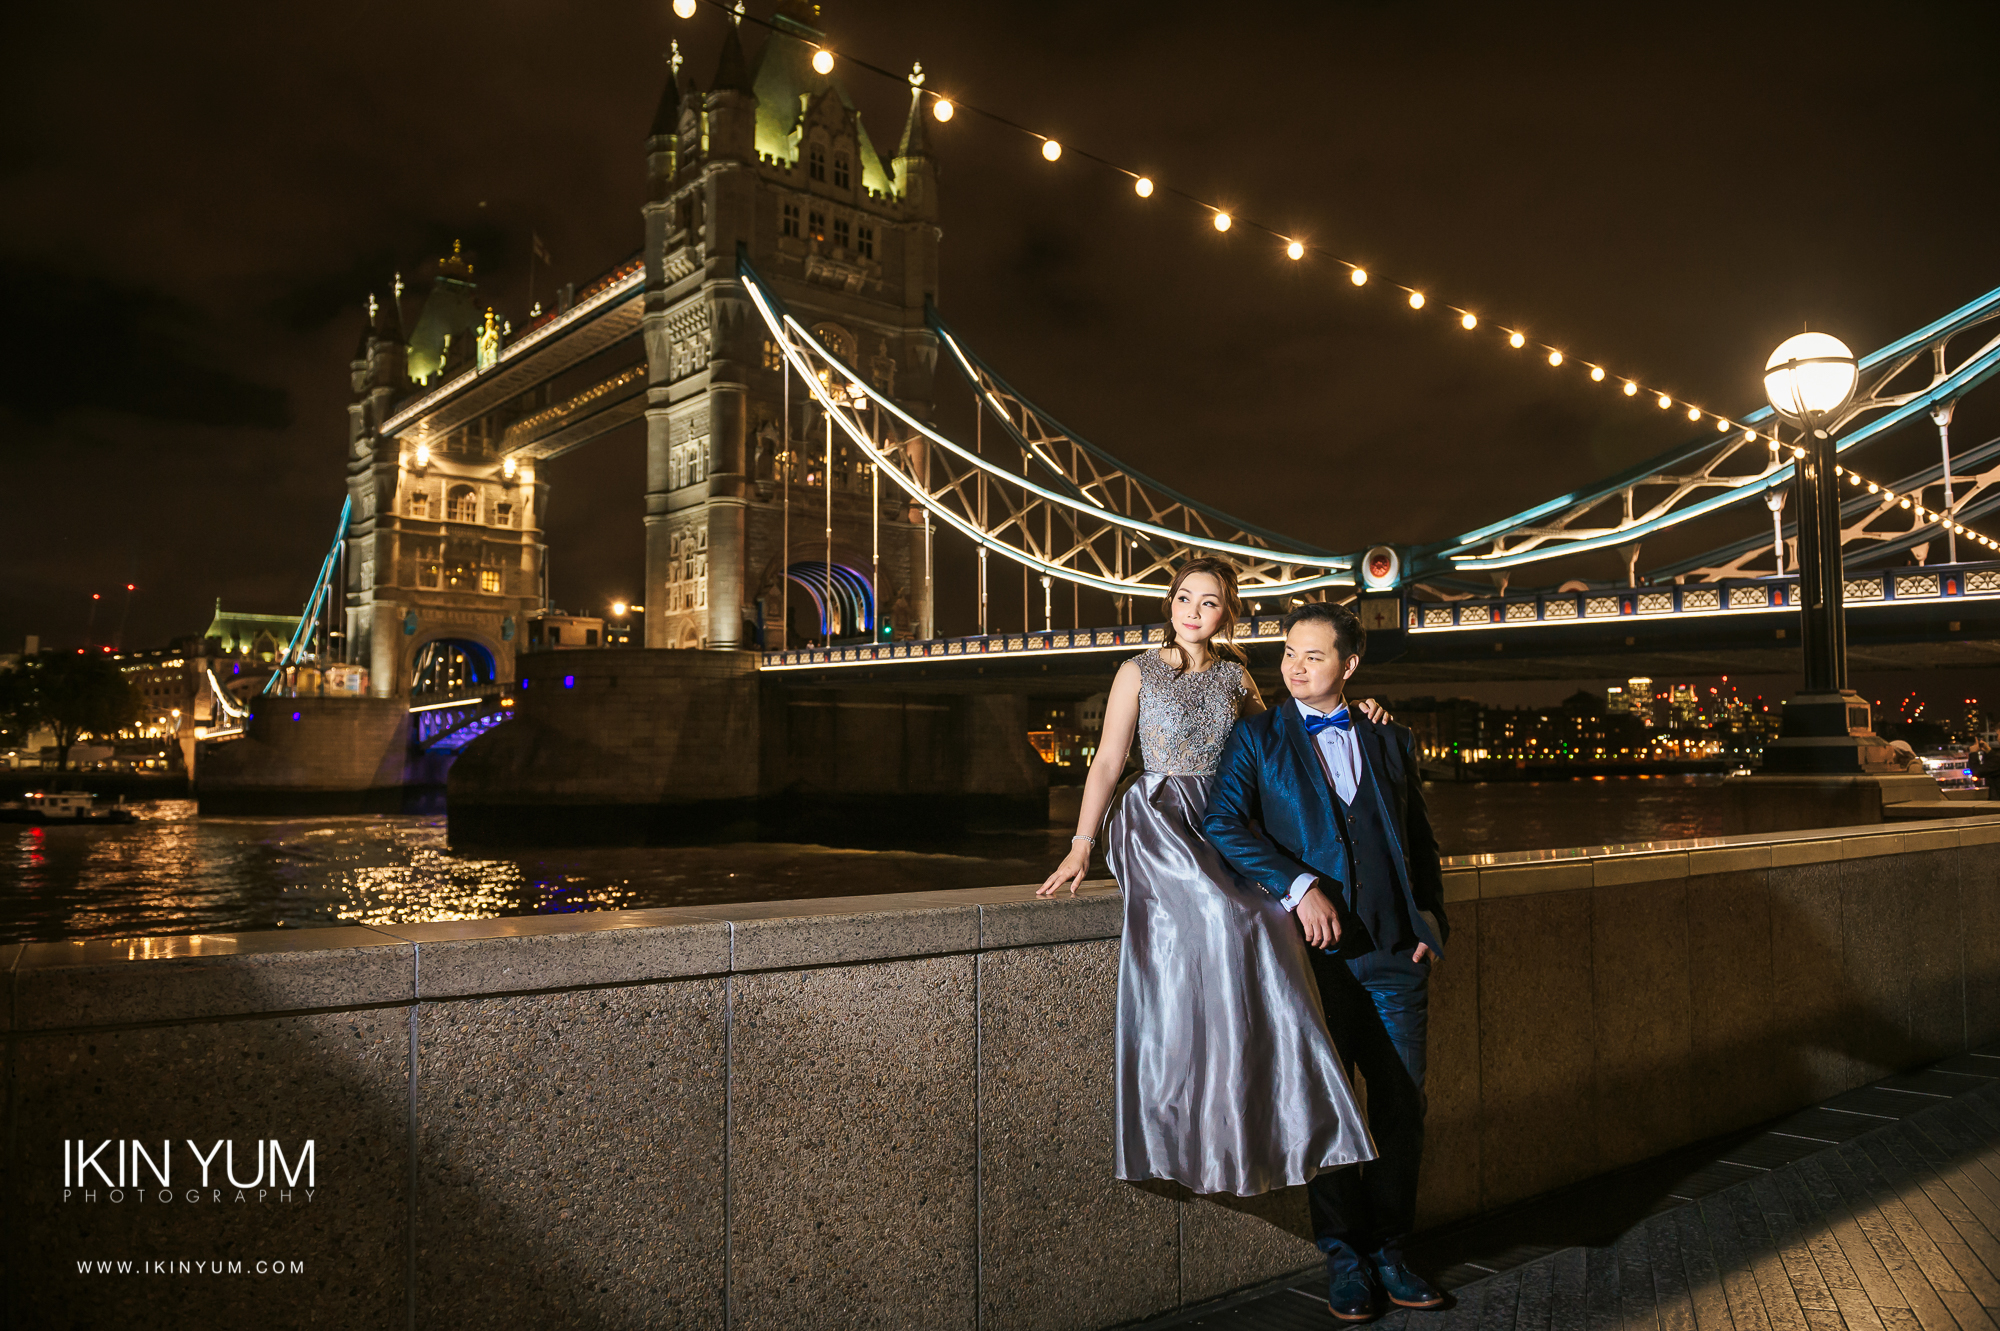 Katie & Steven Pre-Wedding Shoot - Ikin Yum Photography-0095.jpg